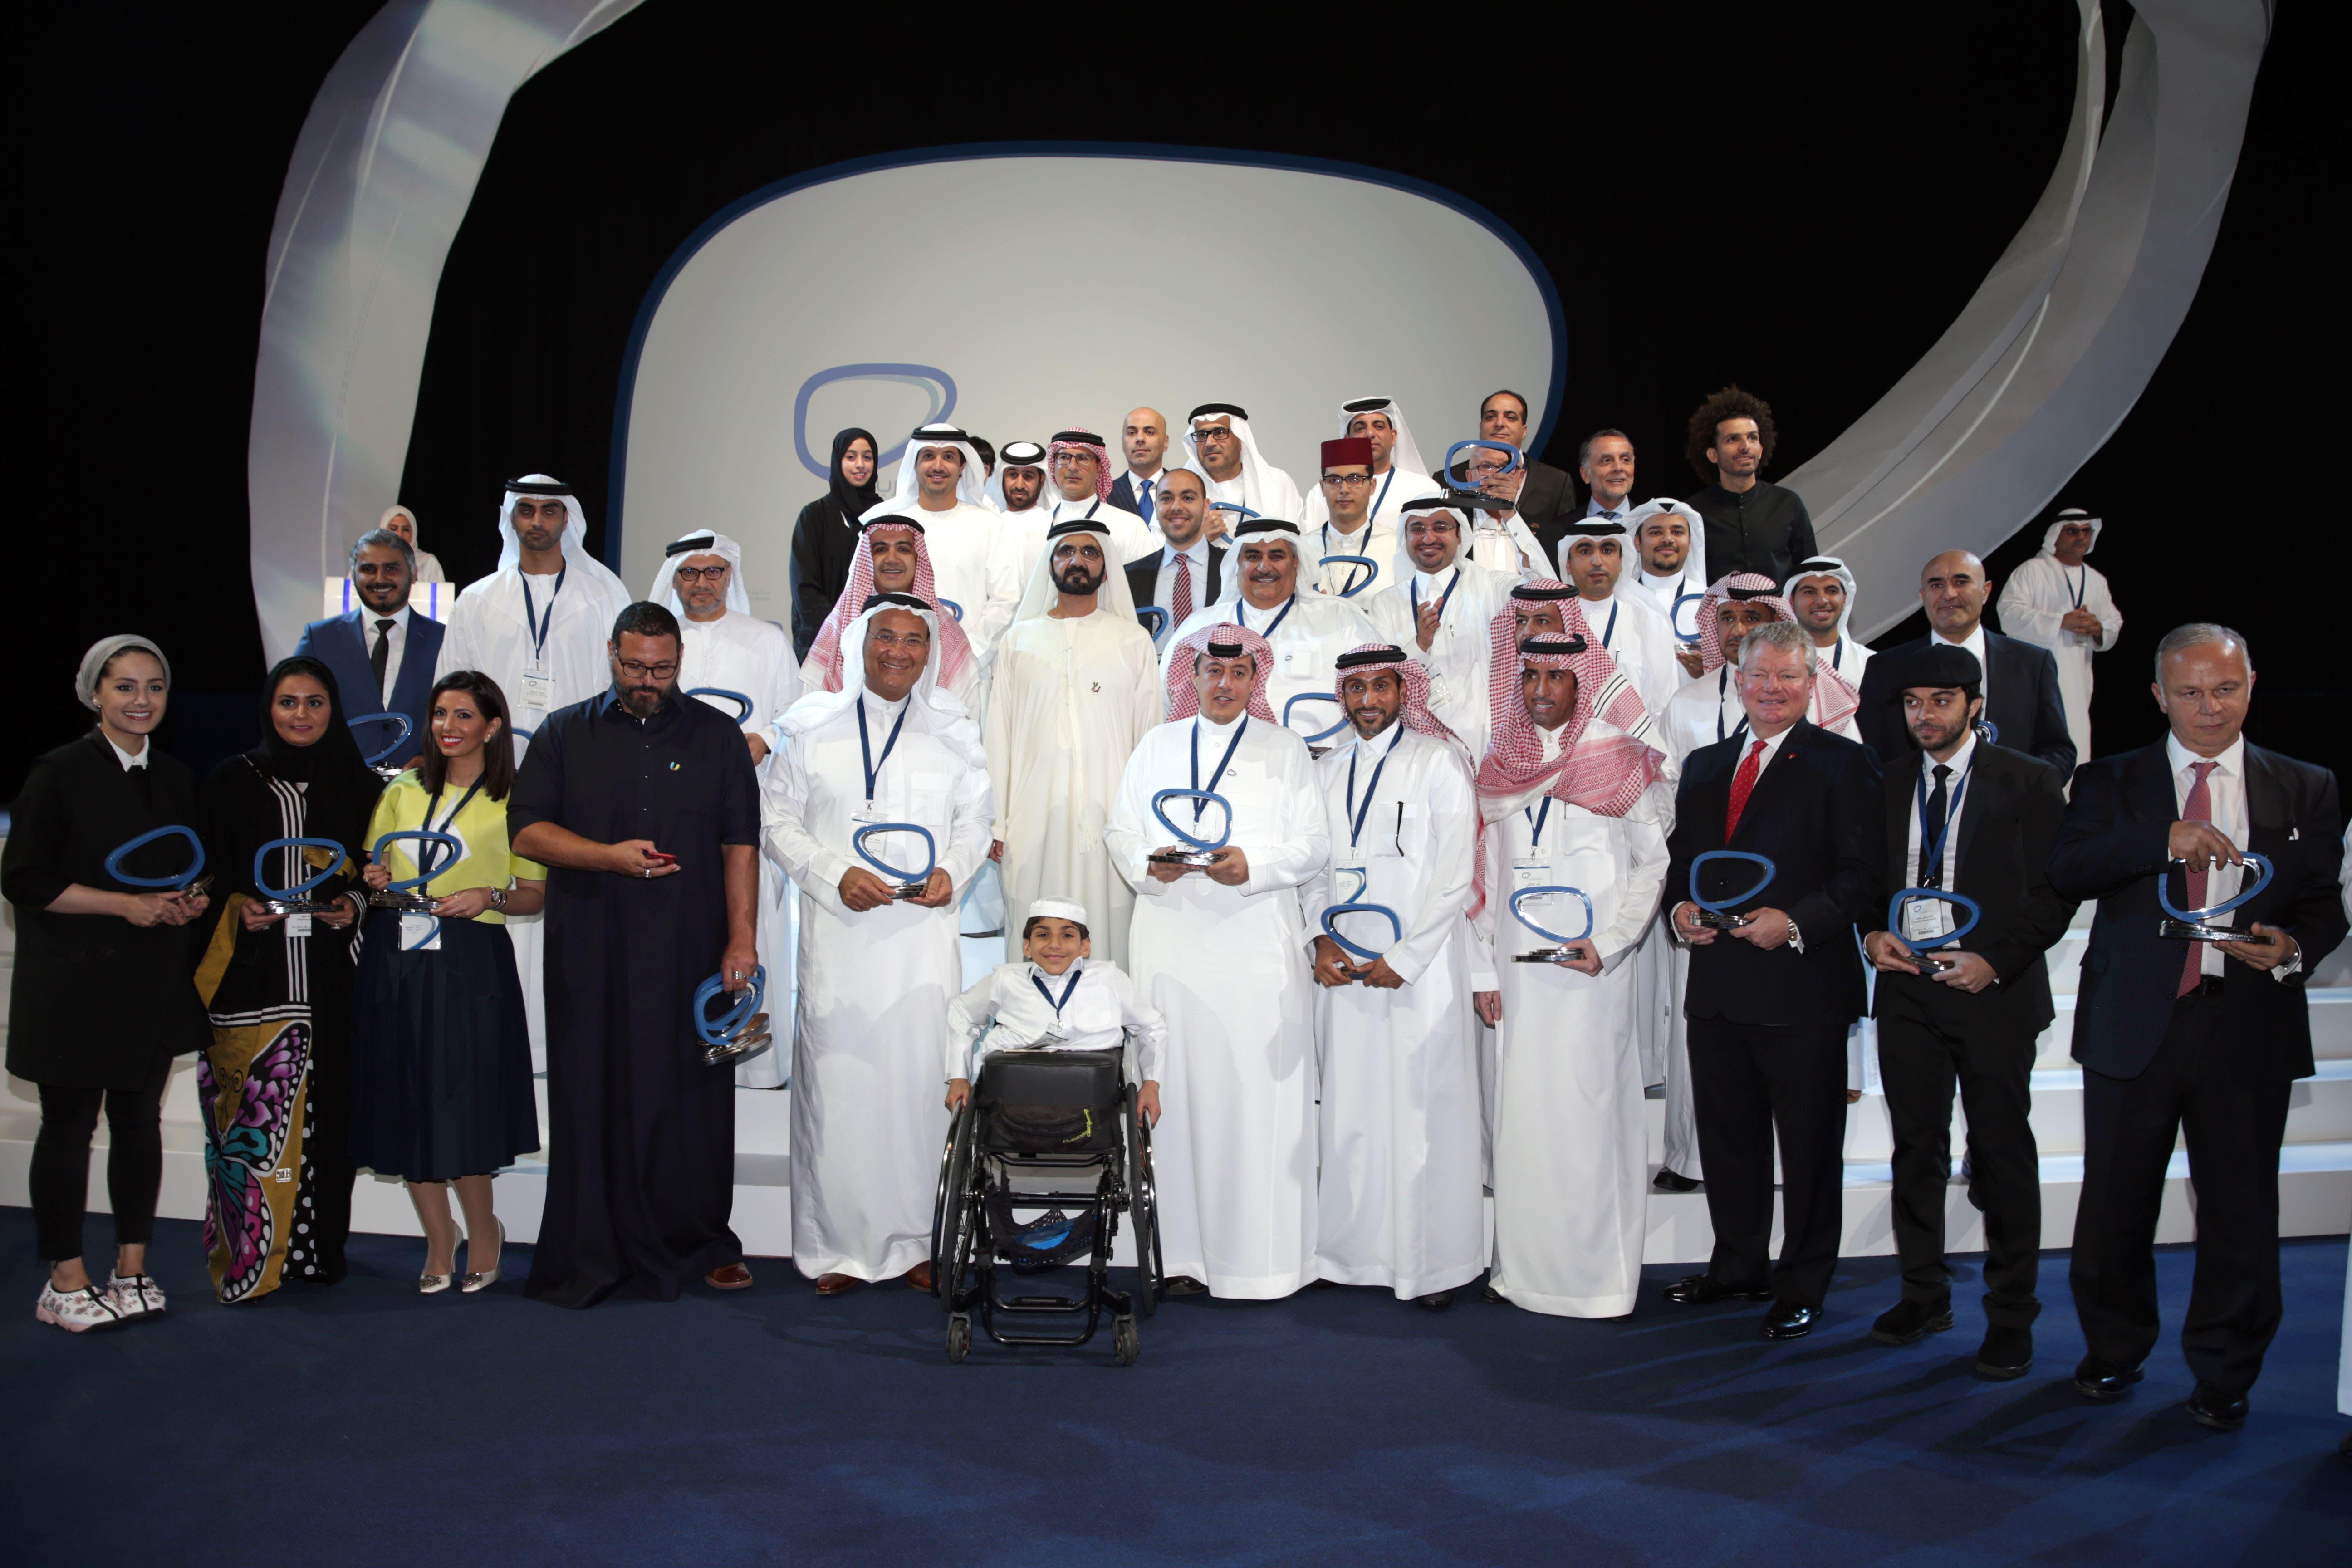 The winners of the Arab Social Media Influencers Awards taking a picture with Dubai Ruler Sheikh Mohammed bin Rashid al-Maktoum. (Courtesy: Dubai Media Office)